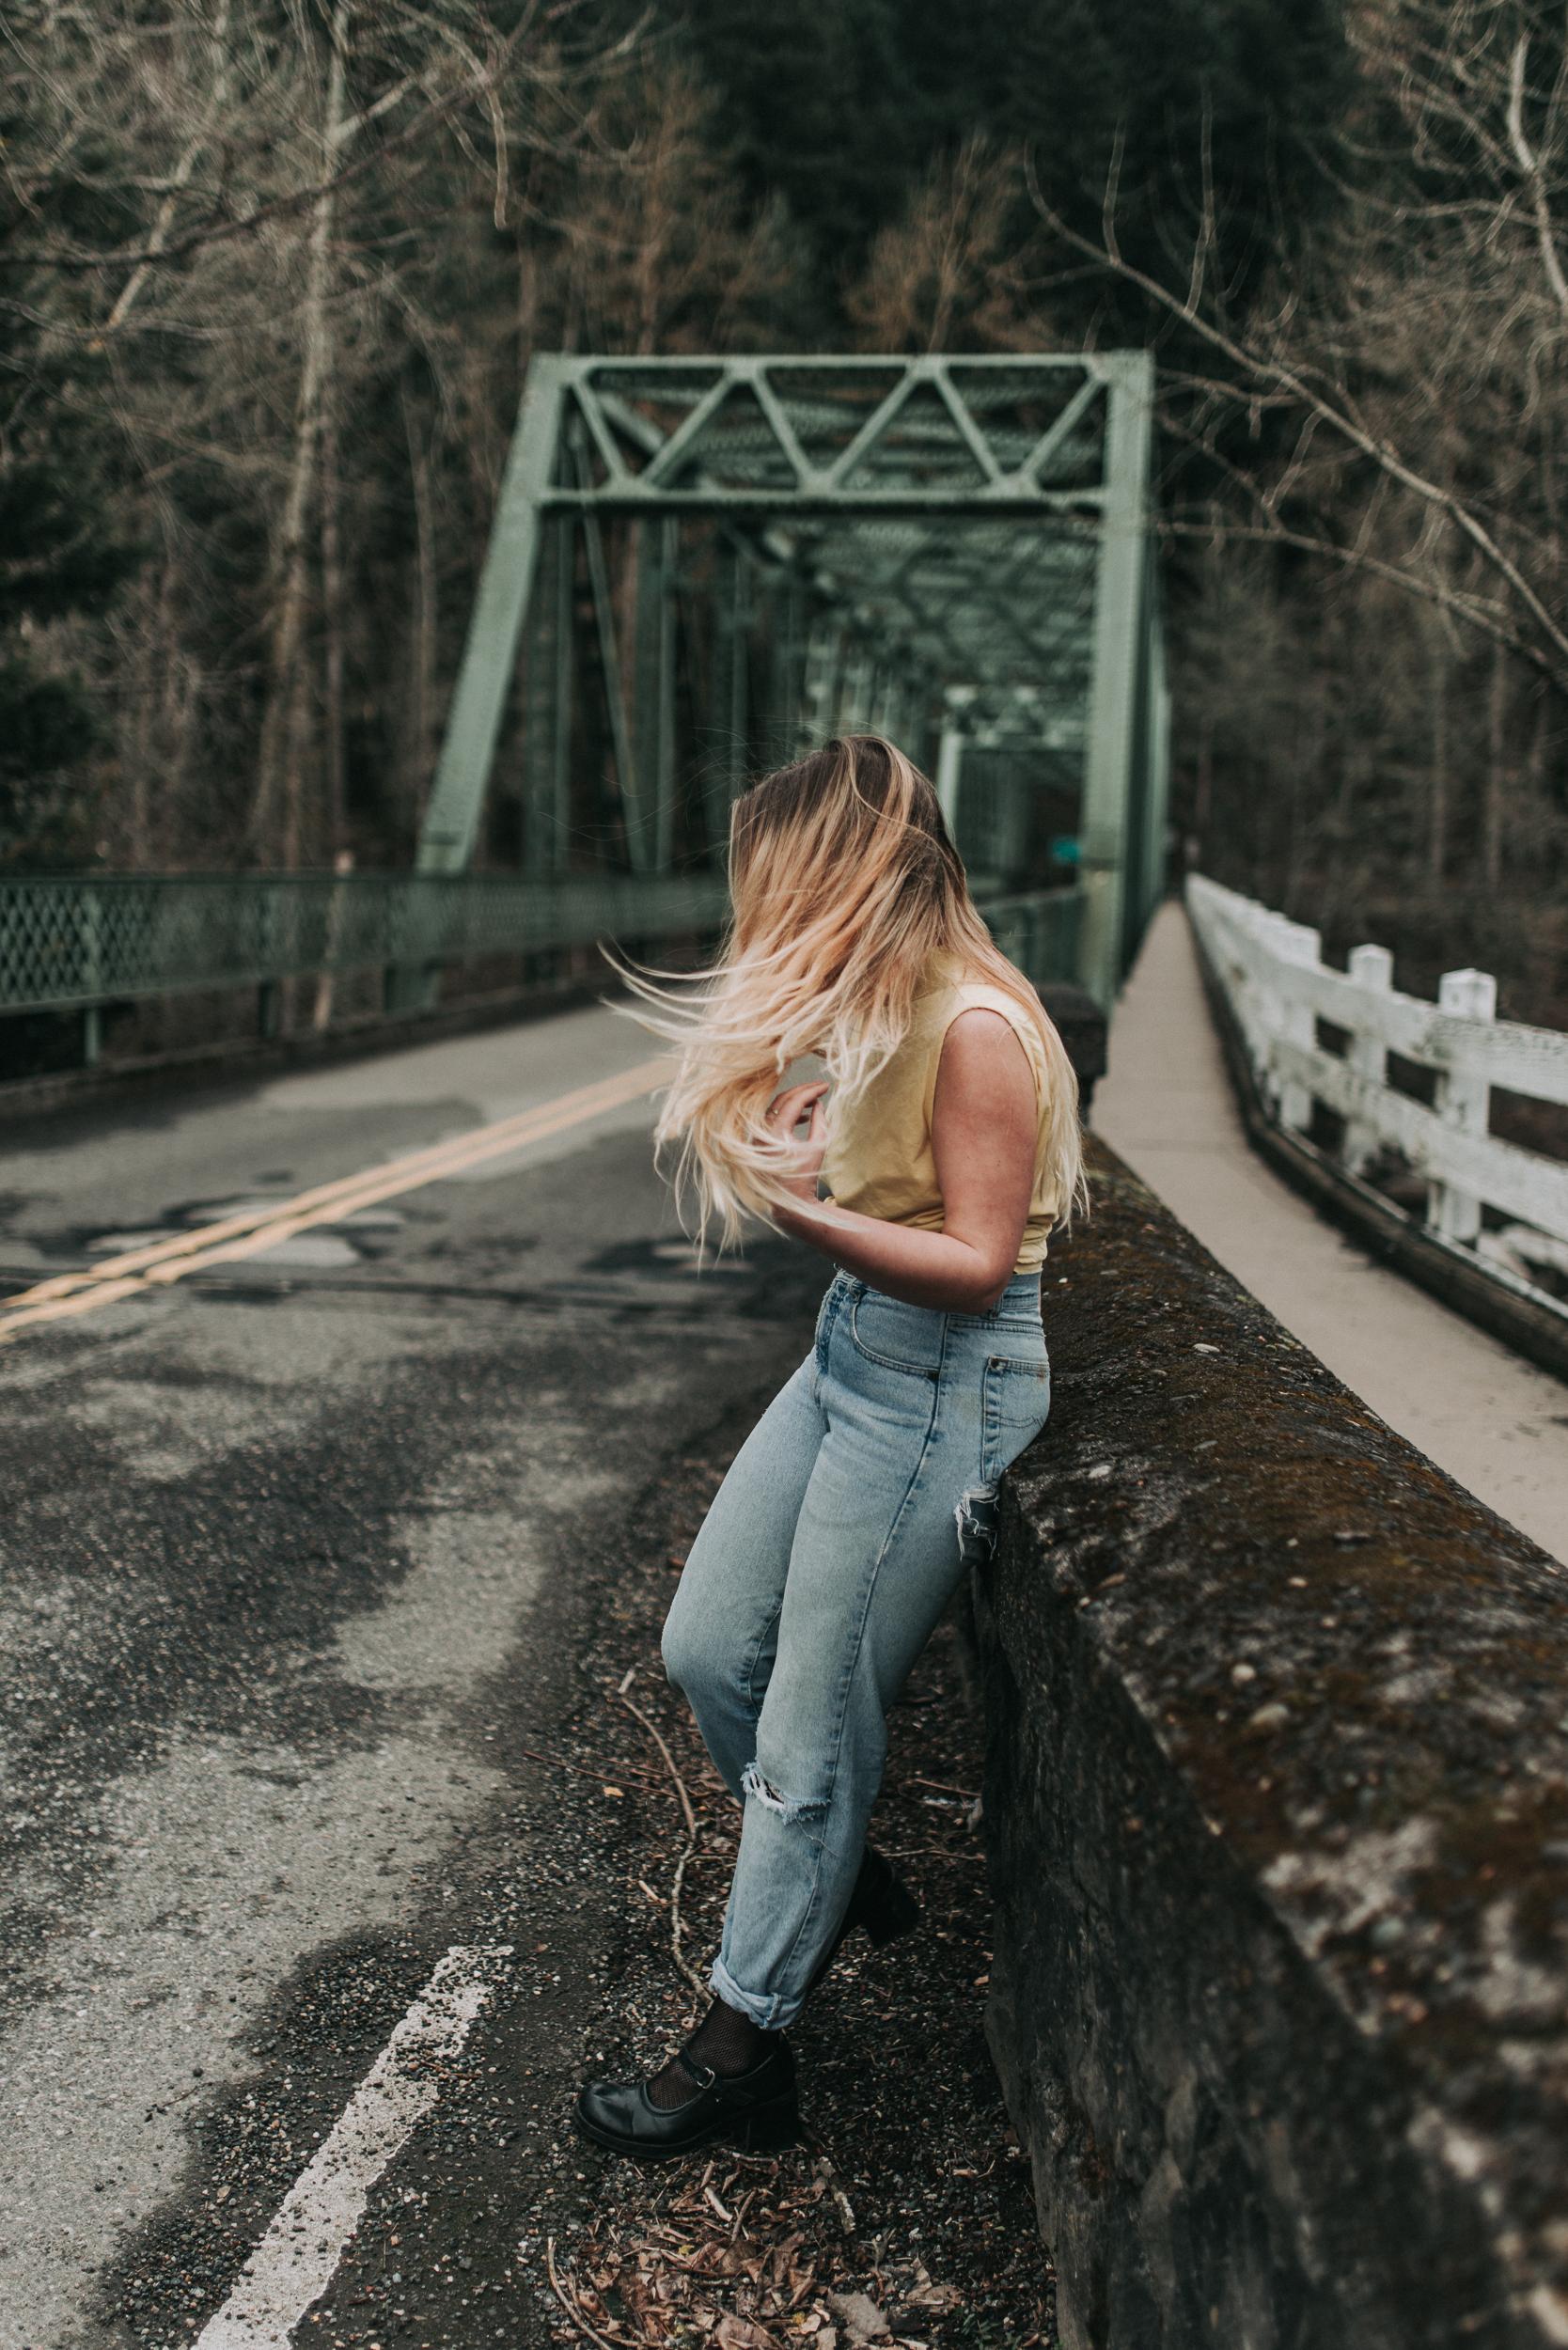 KyleWillisPhoto-Kyle-Willis-Photography-Troutdale-Oregon-Portland-Portrait-Photographer-Abandoned-Photoshoot-Urban-Outfitters-Pacific-Northwest-PNW